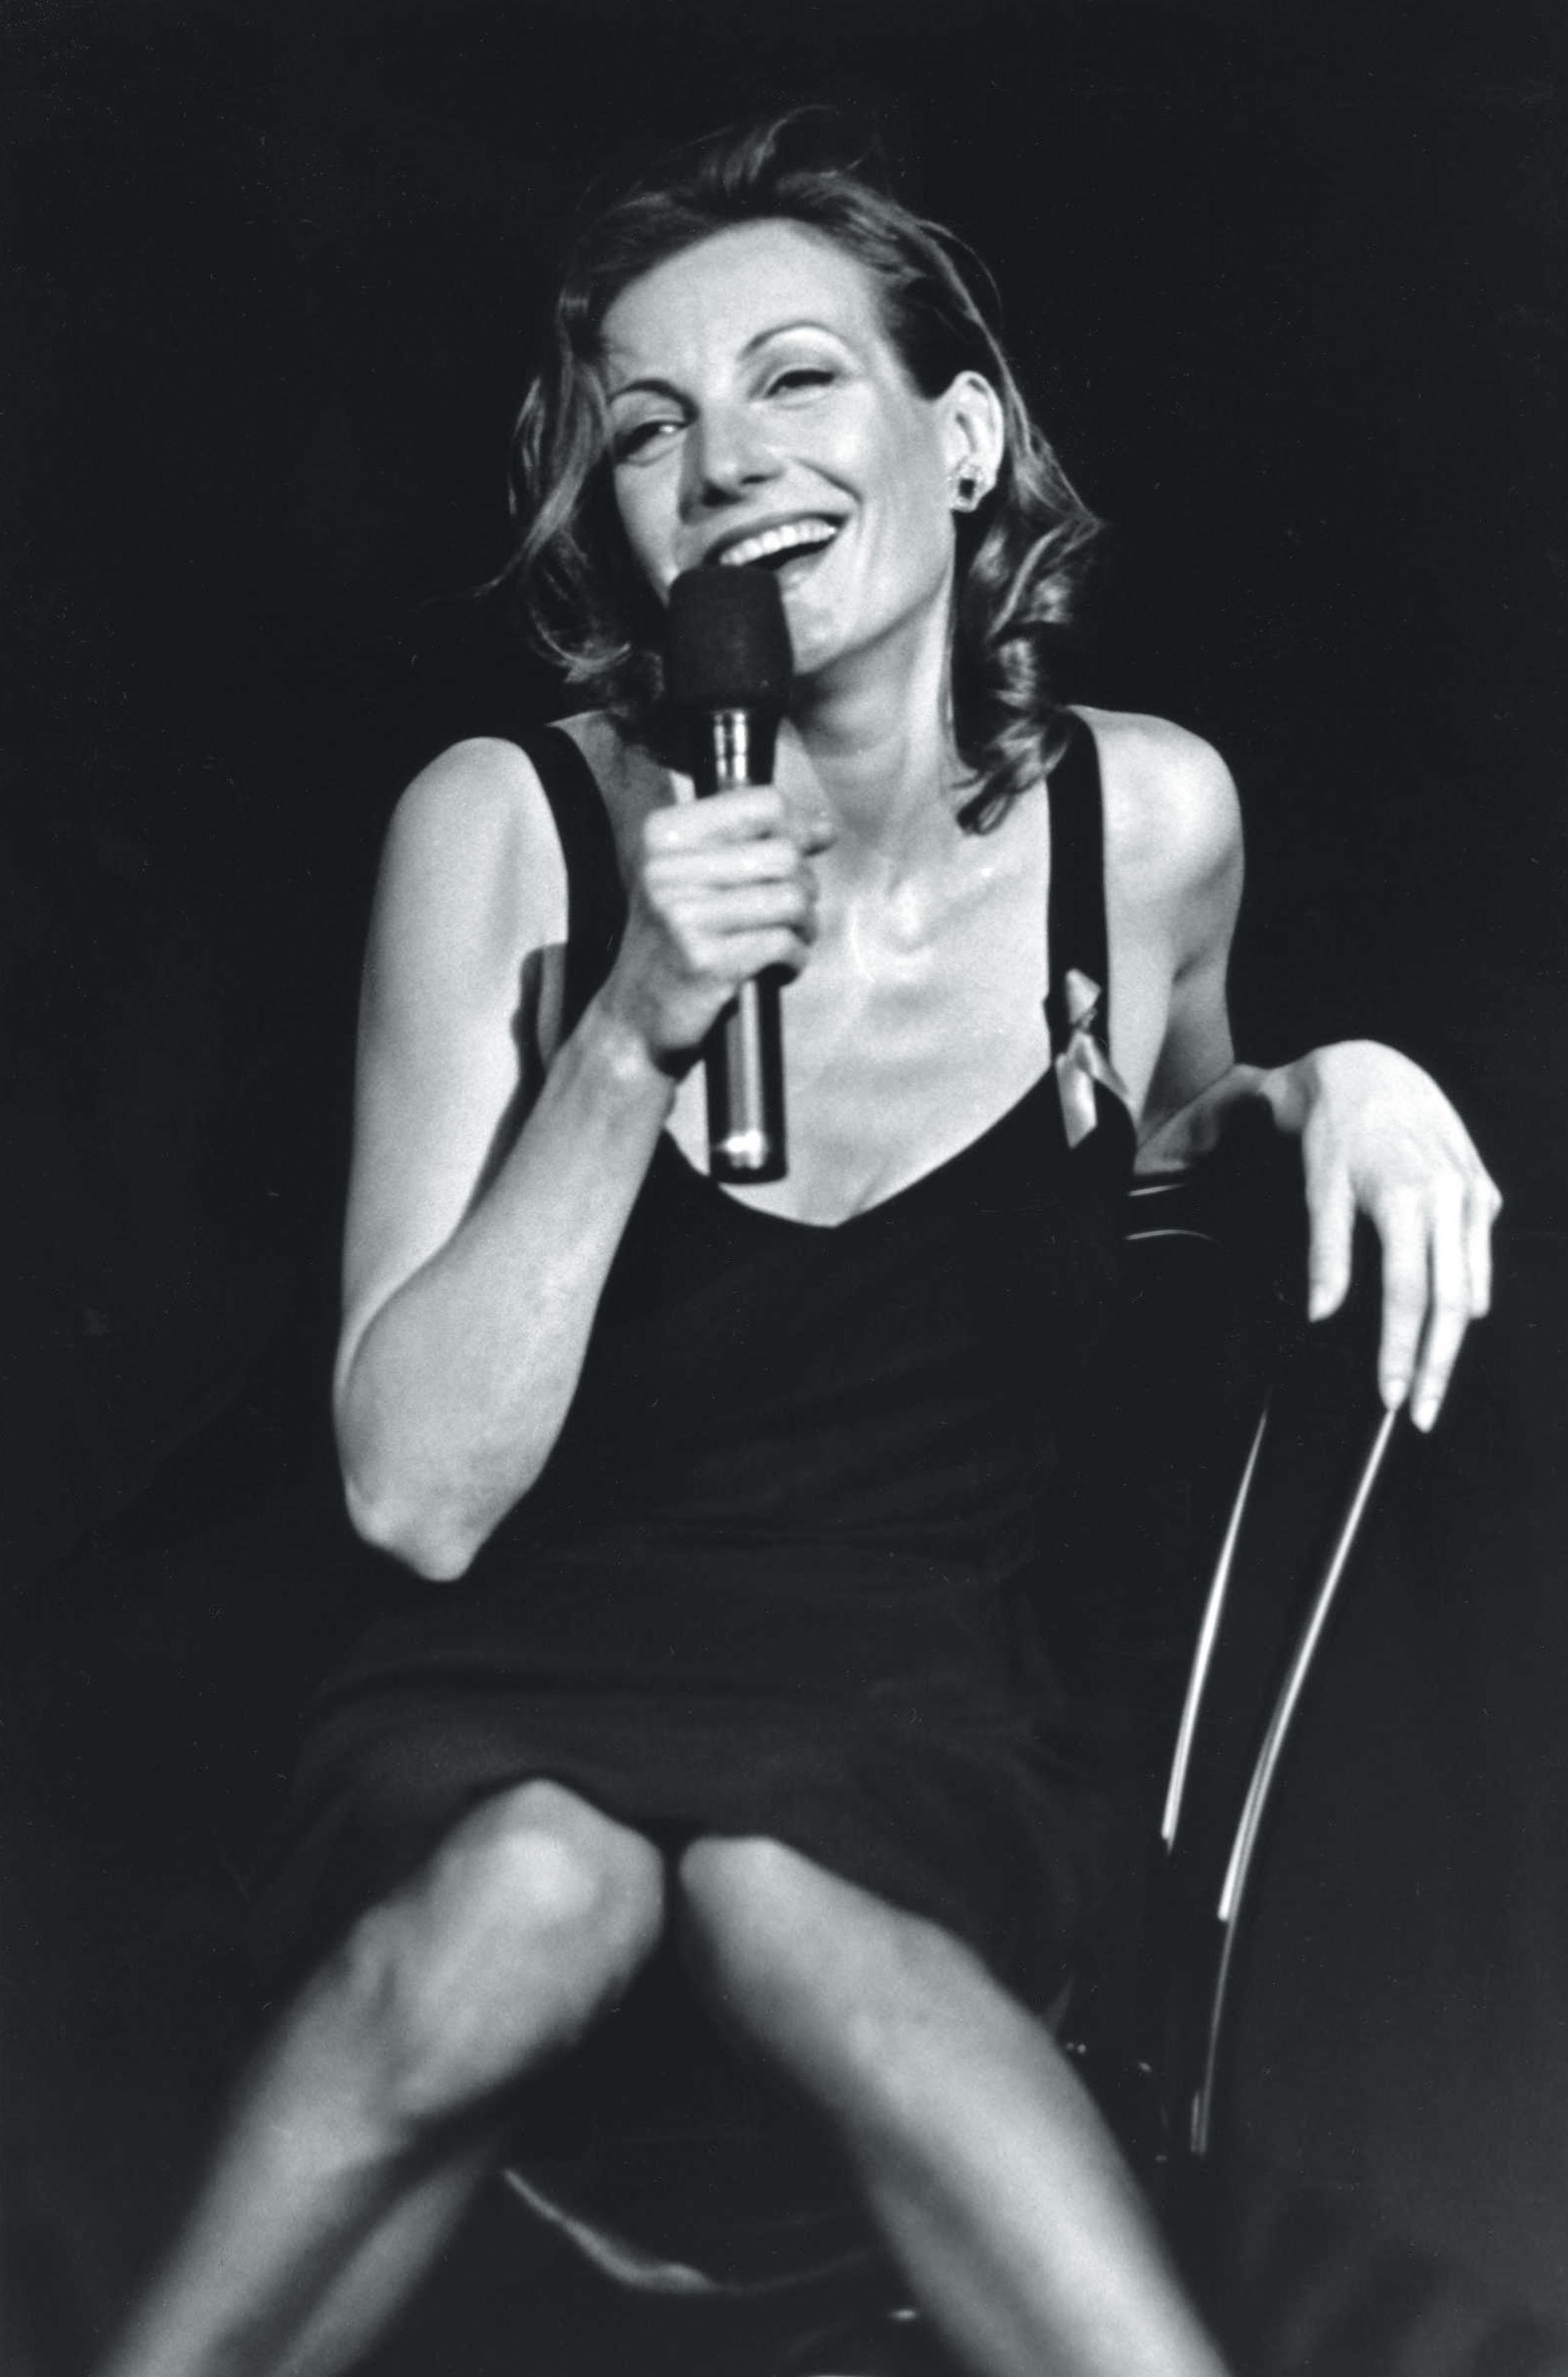 Montreux Jazz Festival >> Festival 1993 | Montreux Jazz